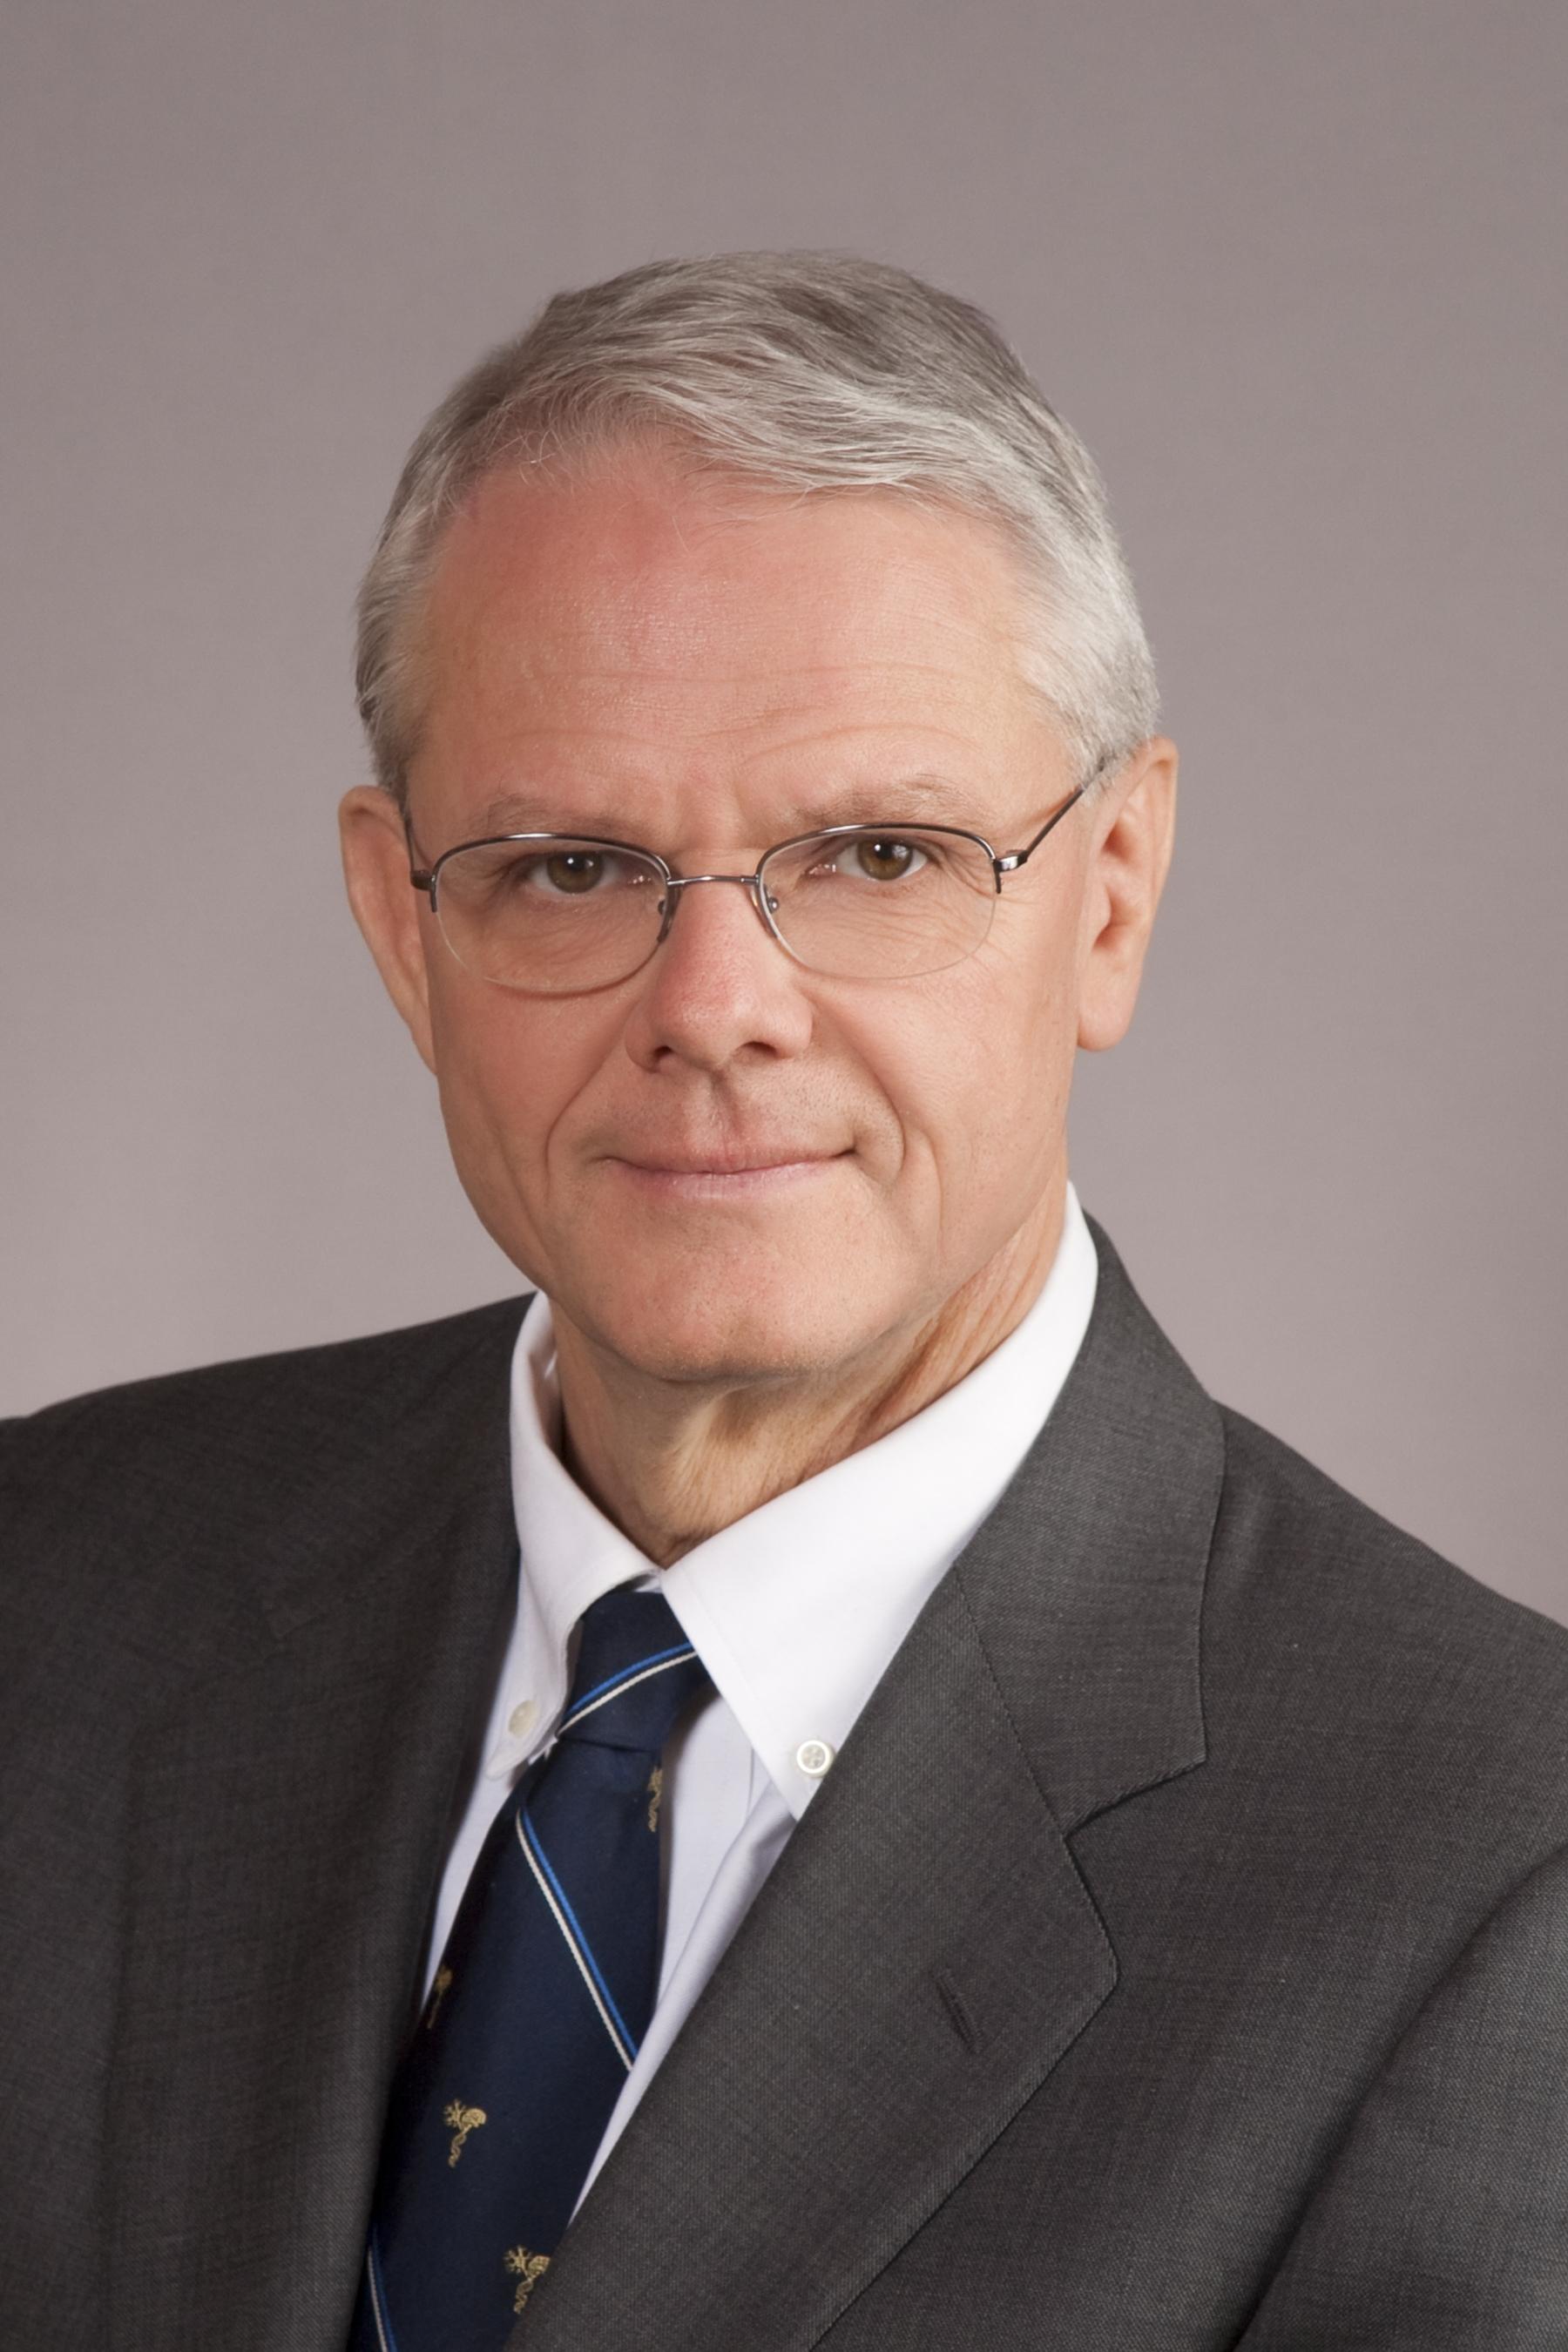 James Rutka